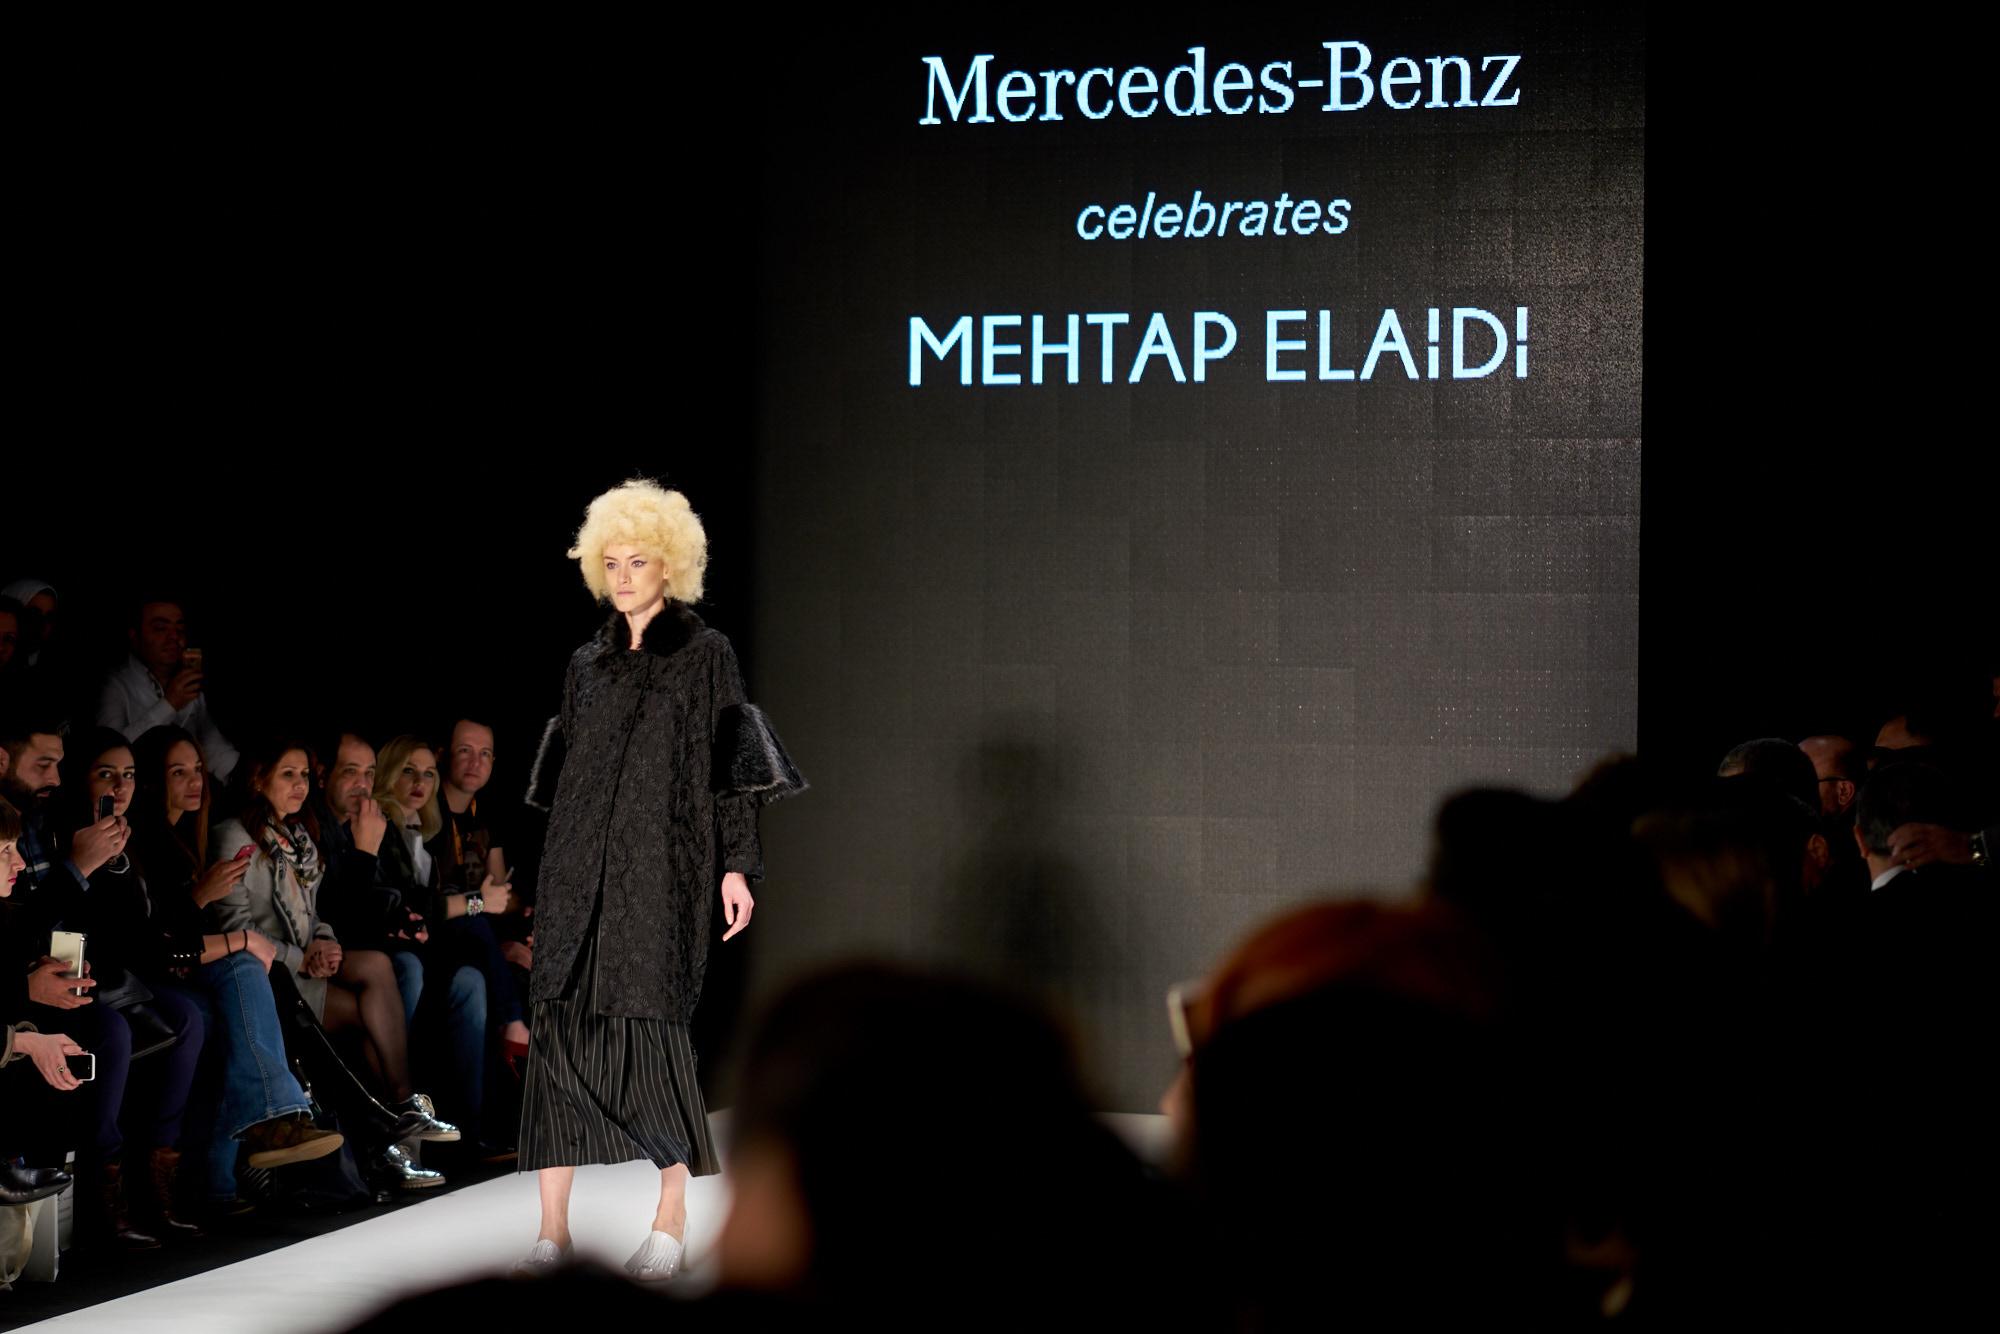 billur saatci, street style, mbfwi, off ne giysem, turkish style blogger, mercedes benz fashion week istanbul, mehtap elaidi, mercedes benz celebrates mehtap elaidi,